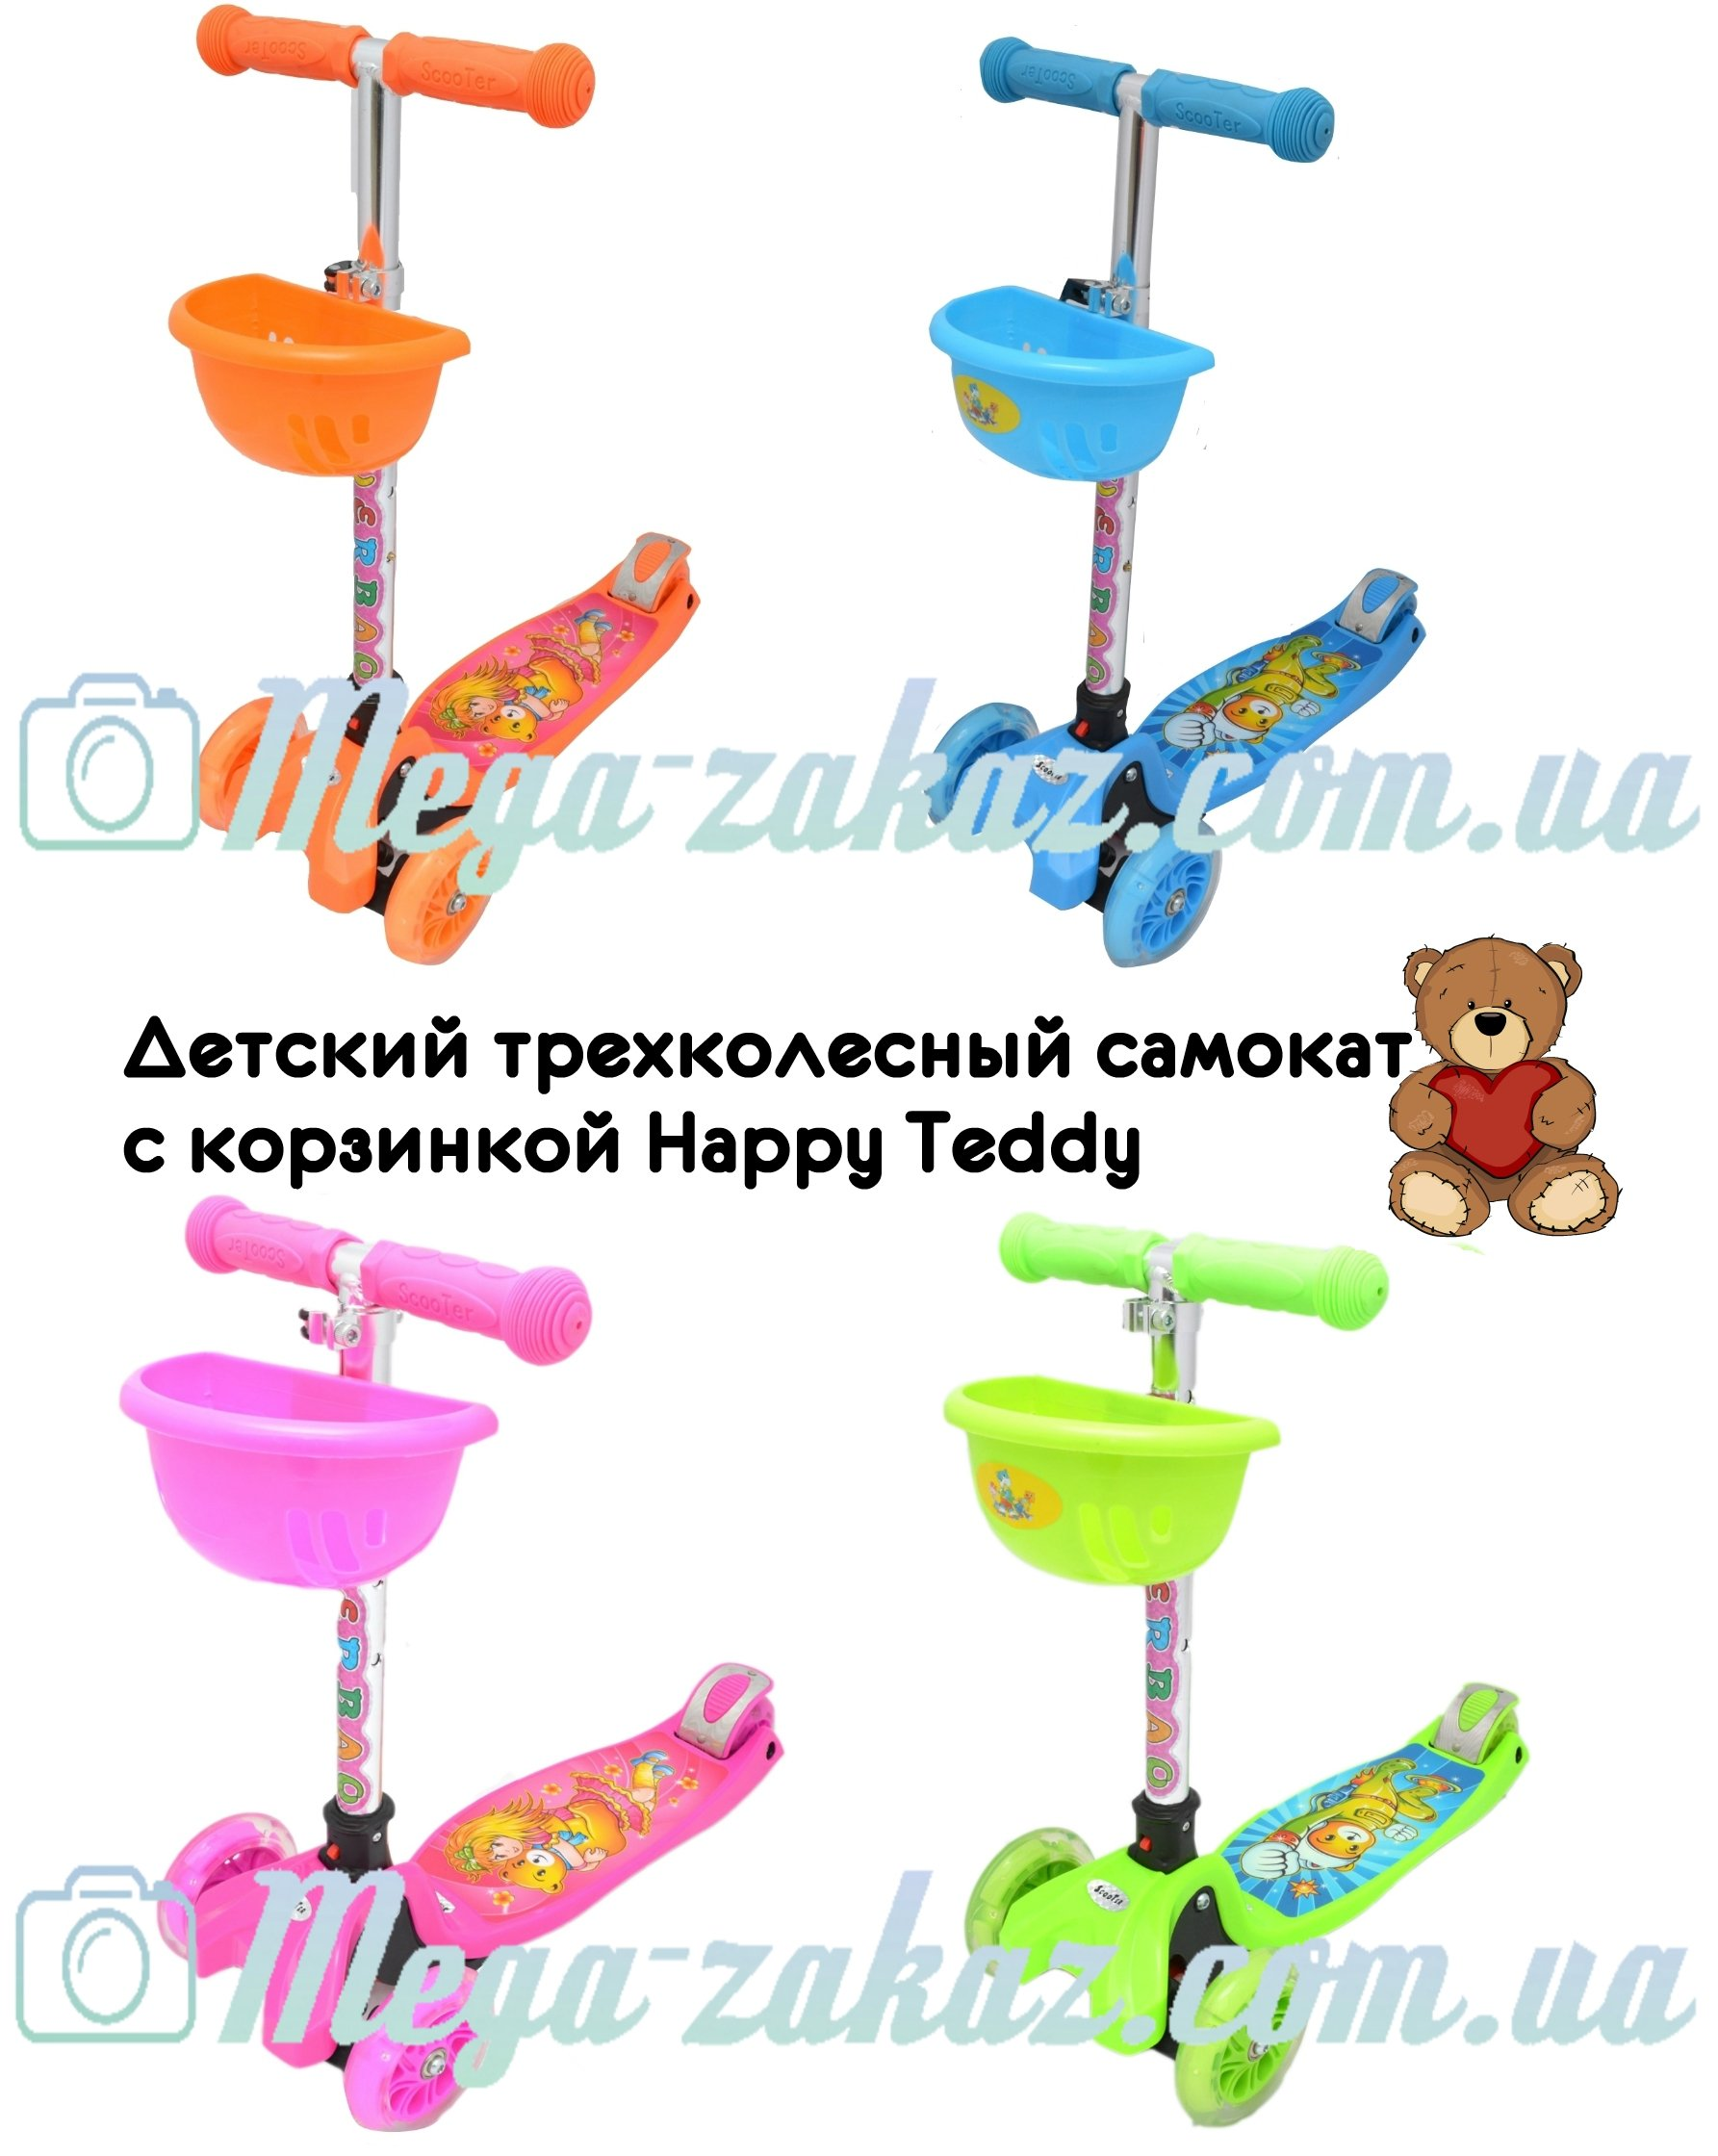 http://mega-zakaz.com.ua/images/upload/самокат%20039ZAKAZ.jpg